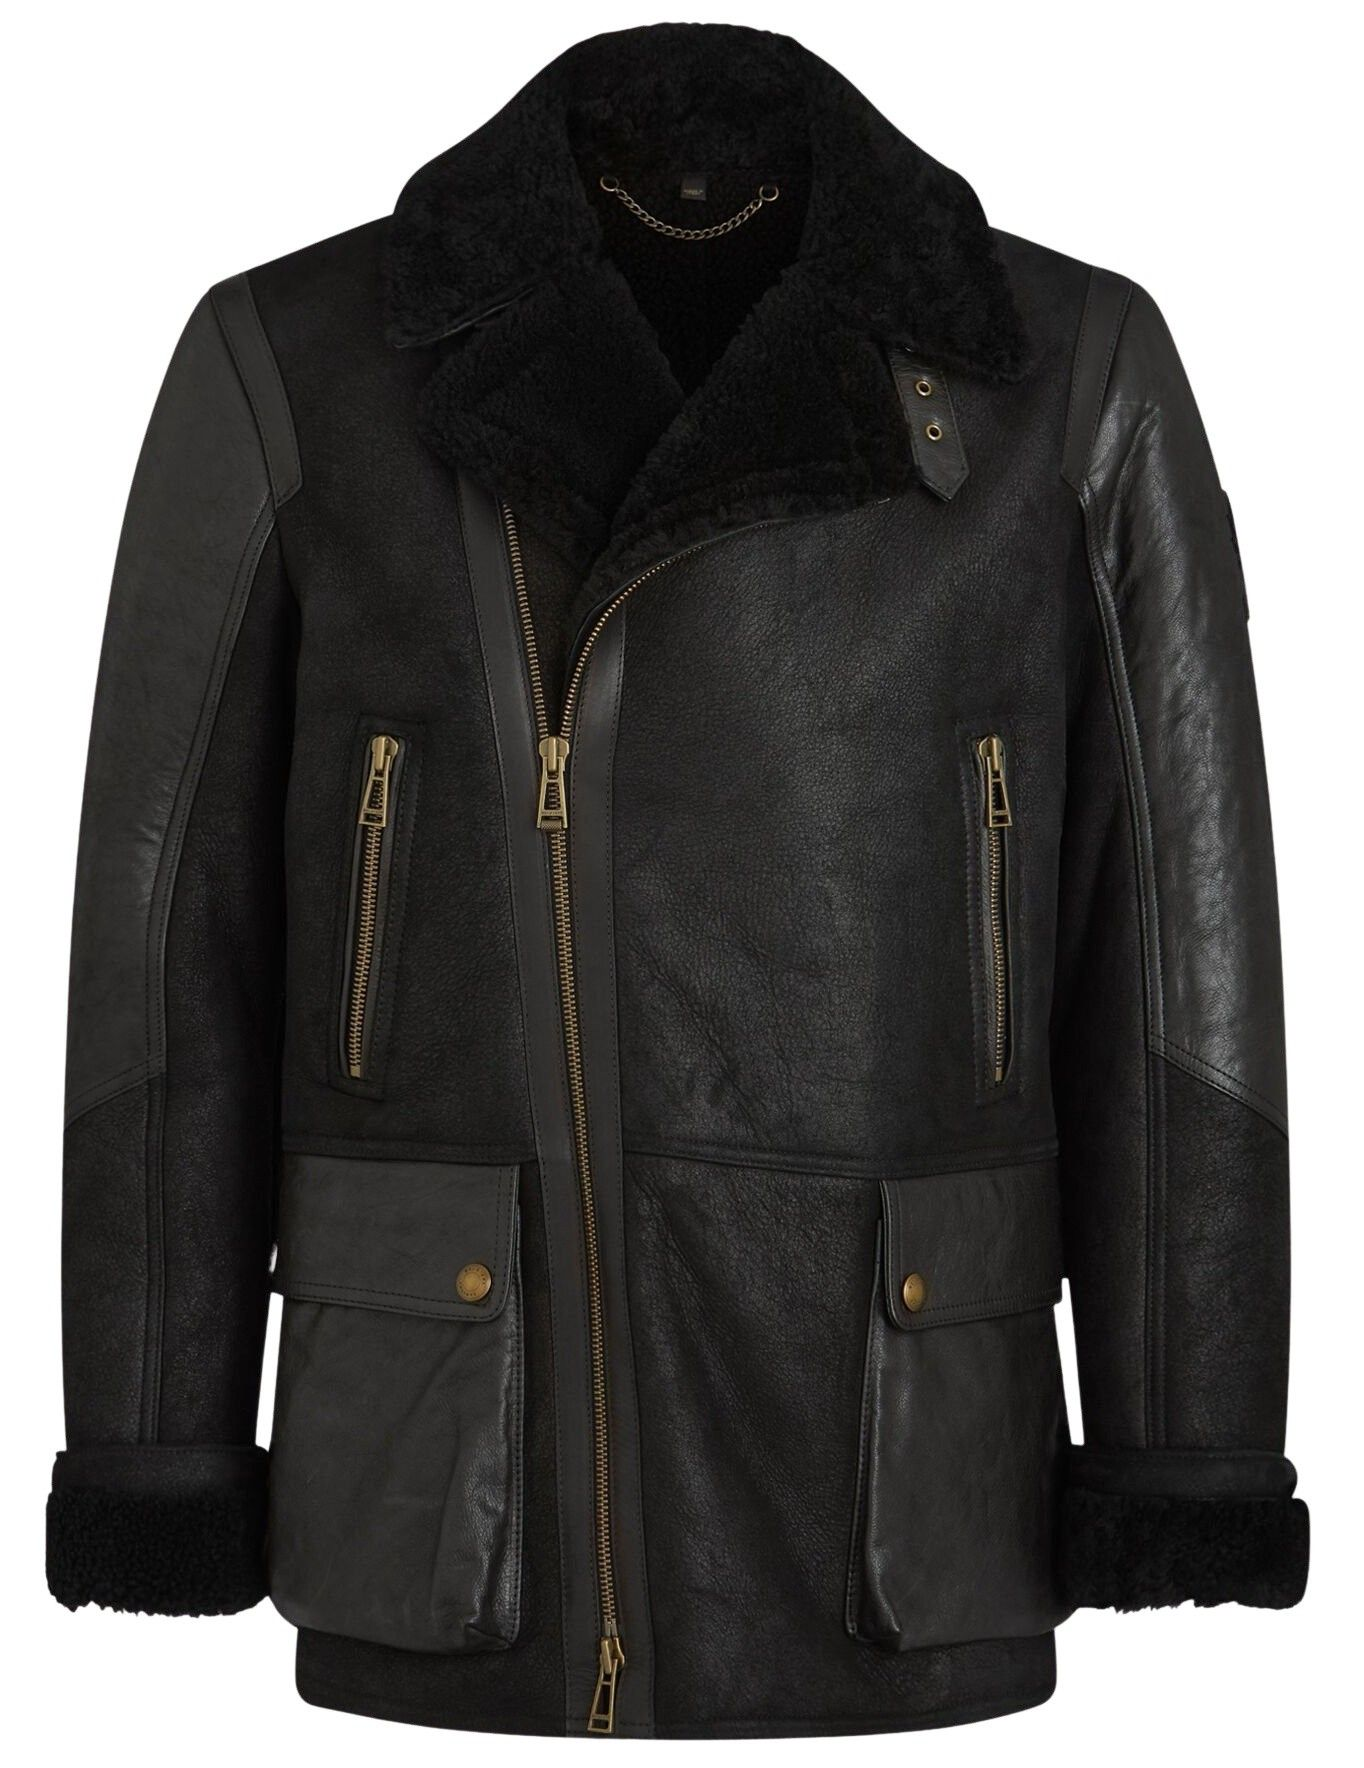 BELSTAFF - Herren Jacke - Dennison Jacket - Black/Black